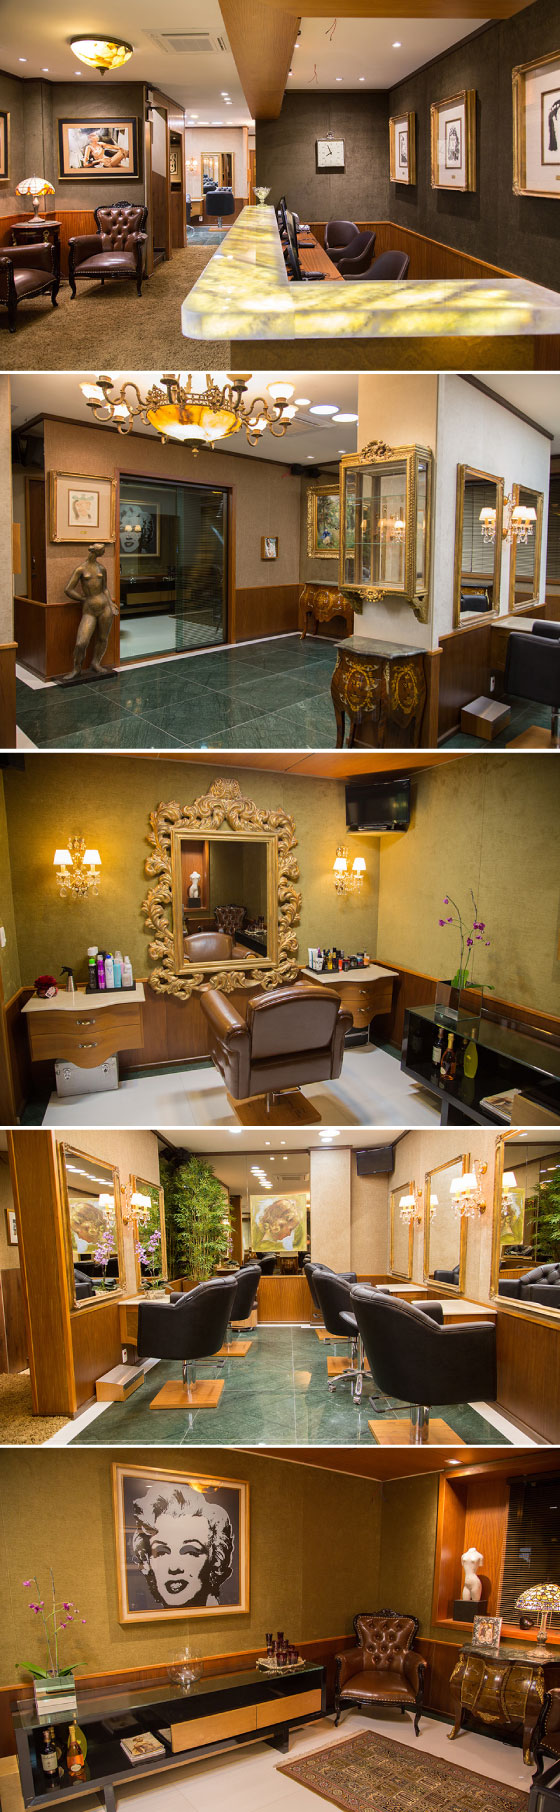 tp-beauty-lounge-tiago-parente-leblon-salao-novo-rio-de-janeiro